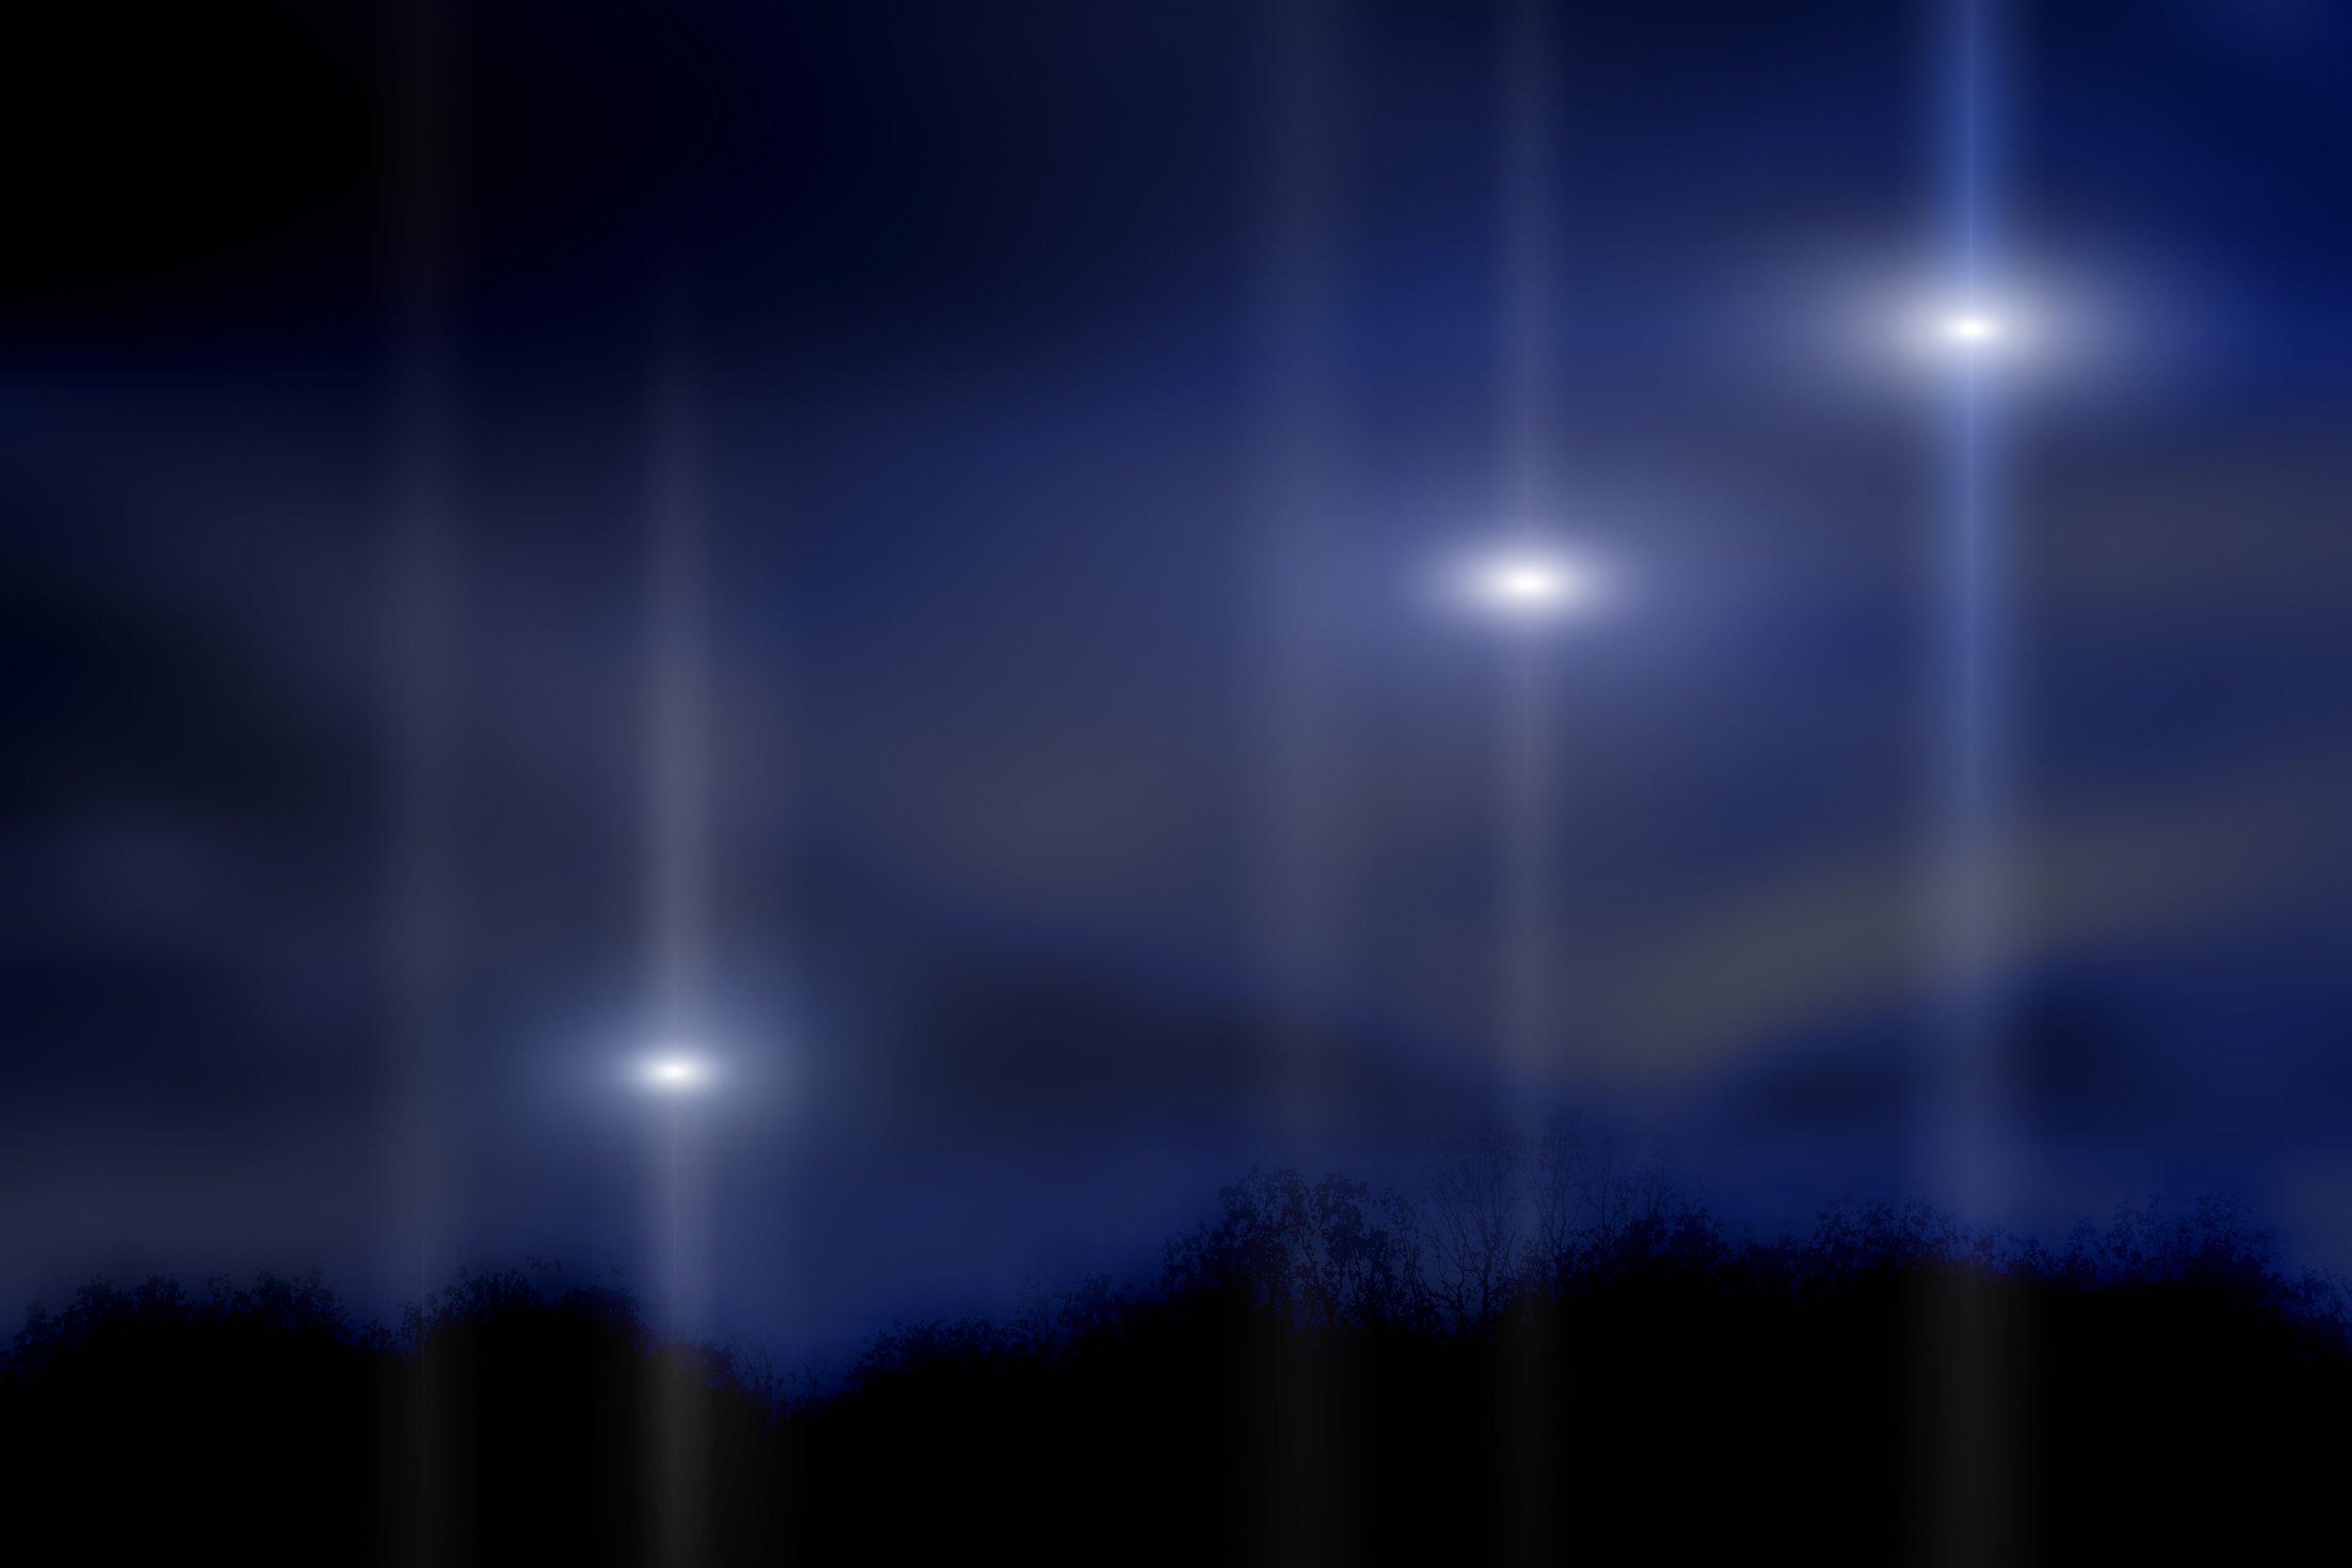 generic UFO